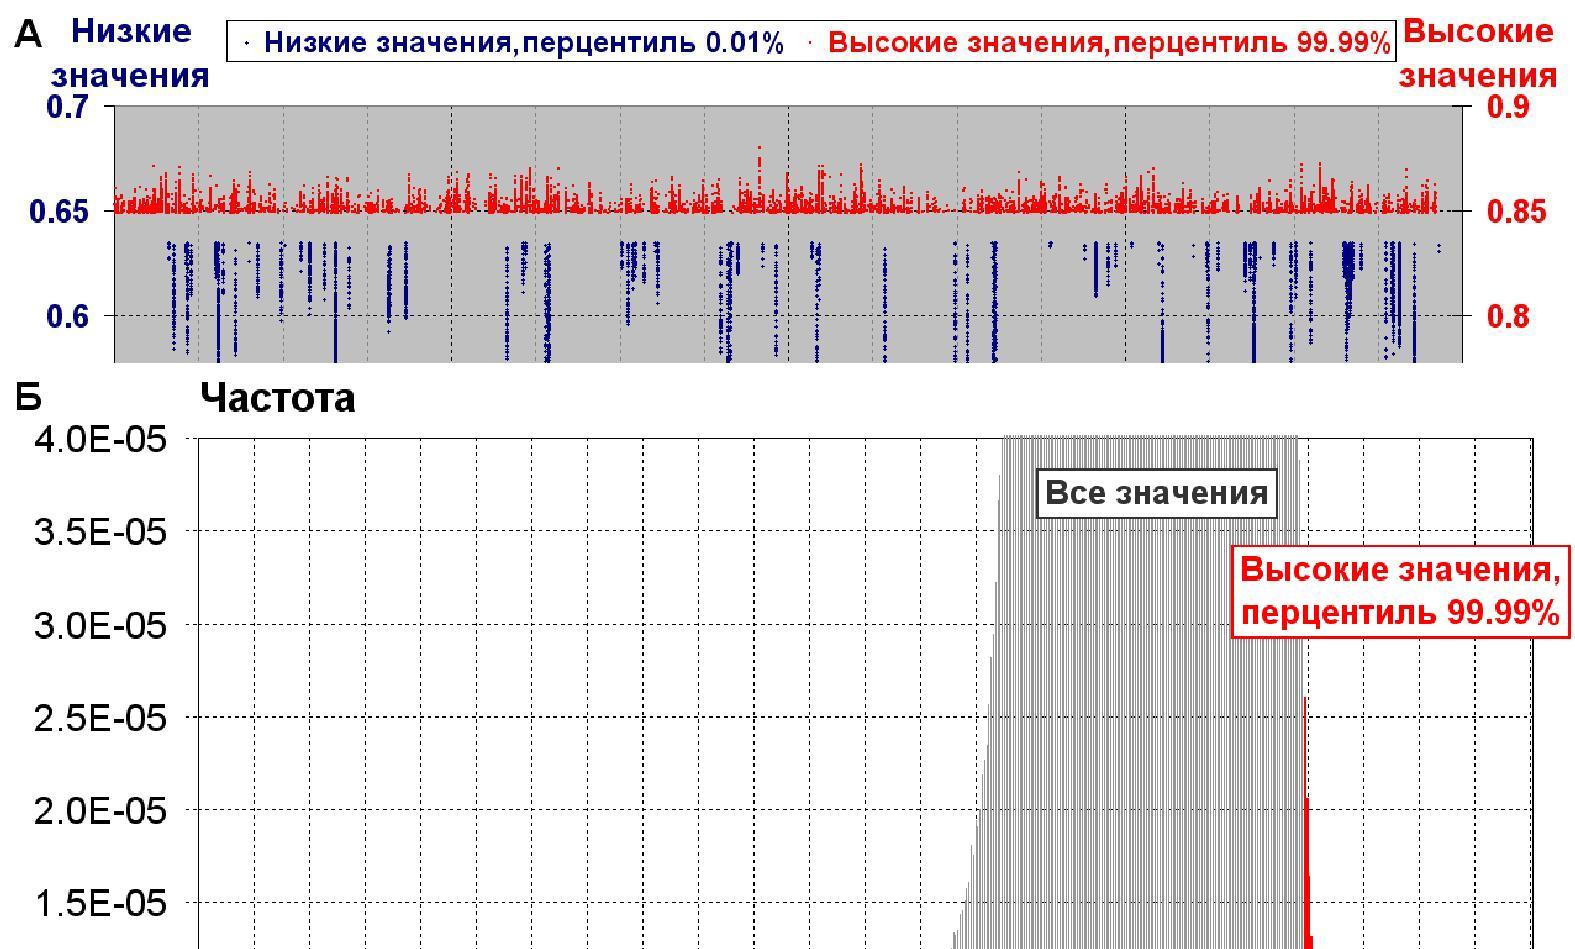 http://www.bionet.nsc.ru/images/important/5_2.JPG